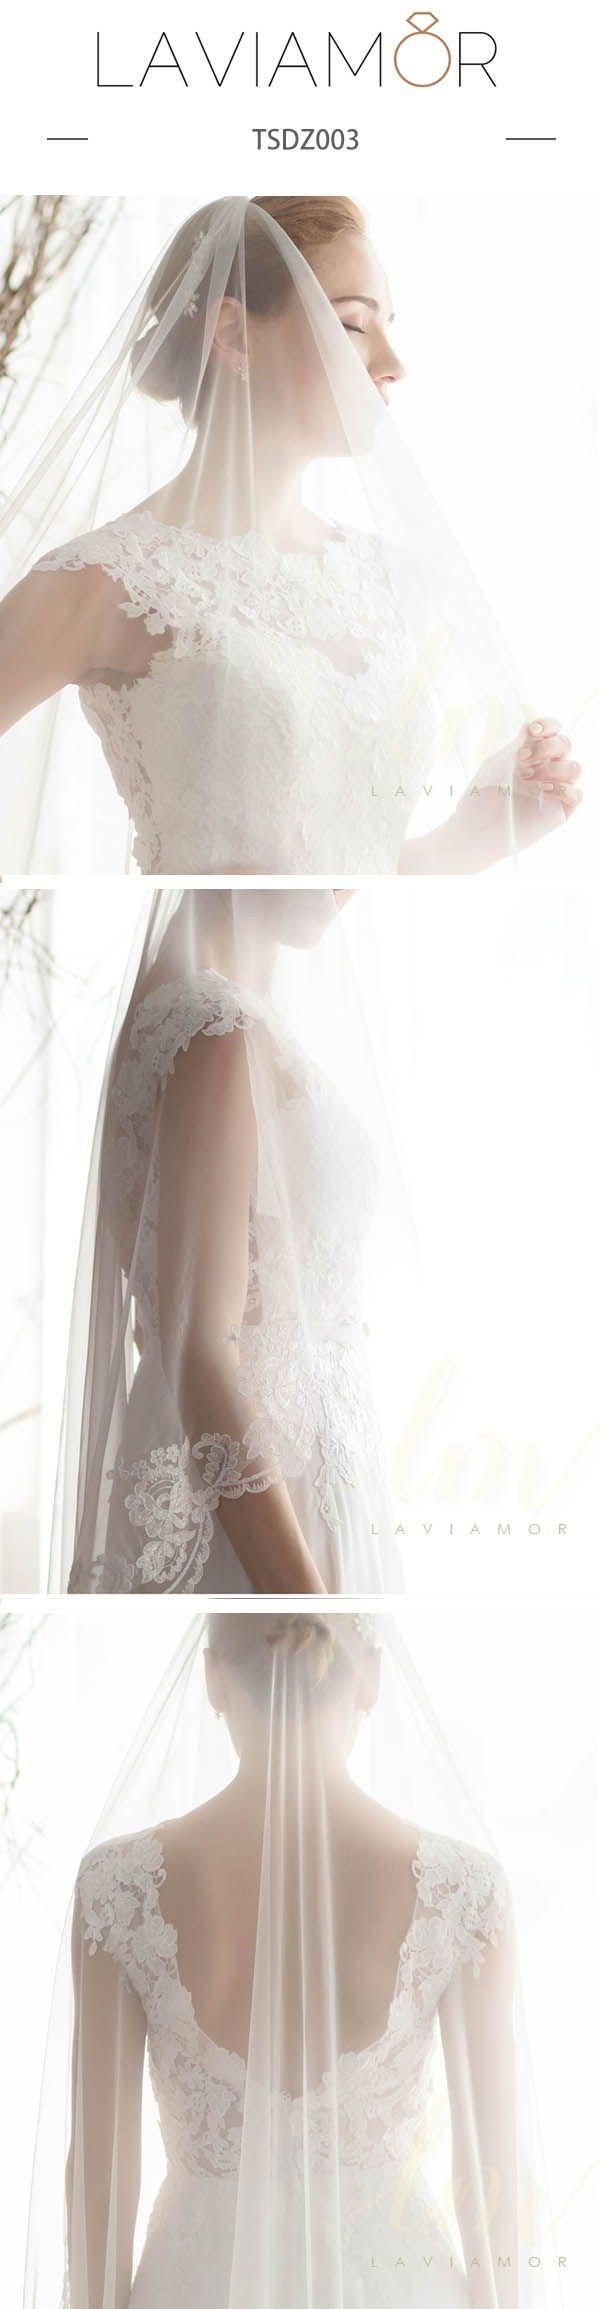 Elegant 1 Tier Mantilla Wedding Veil Drop Wedding Veil With Comb TSDZ003 | Laviamor